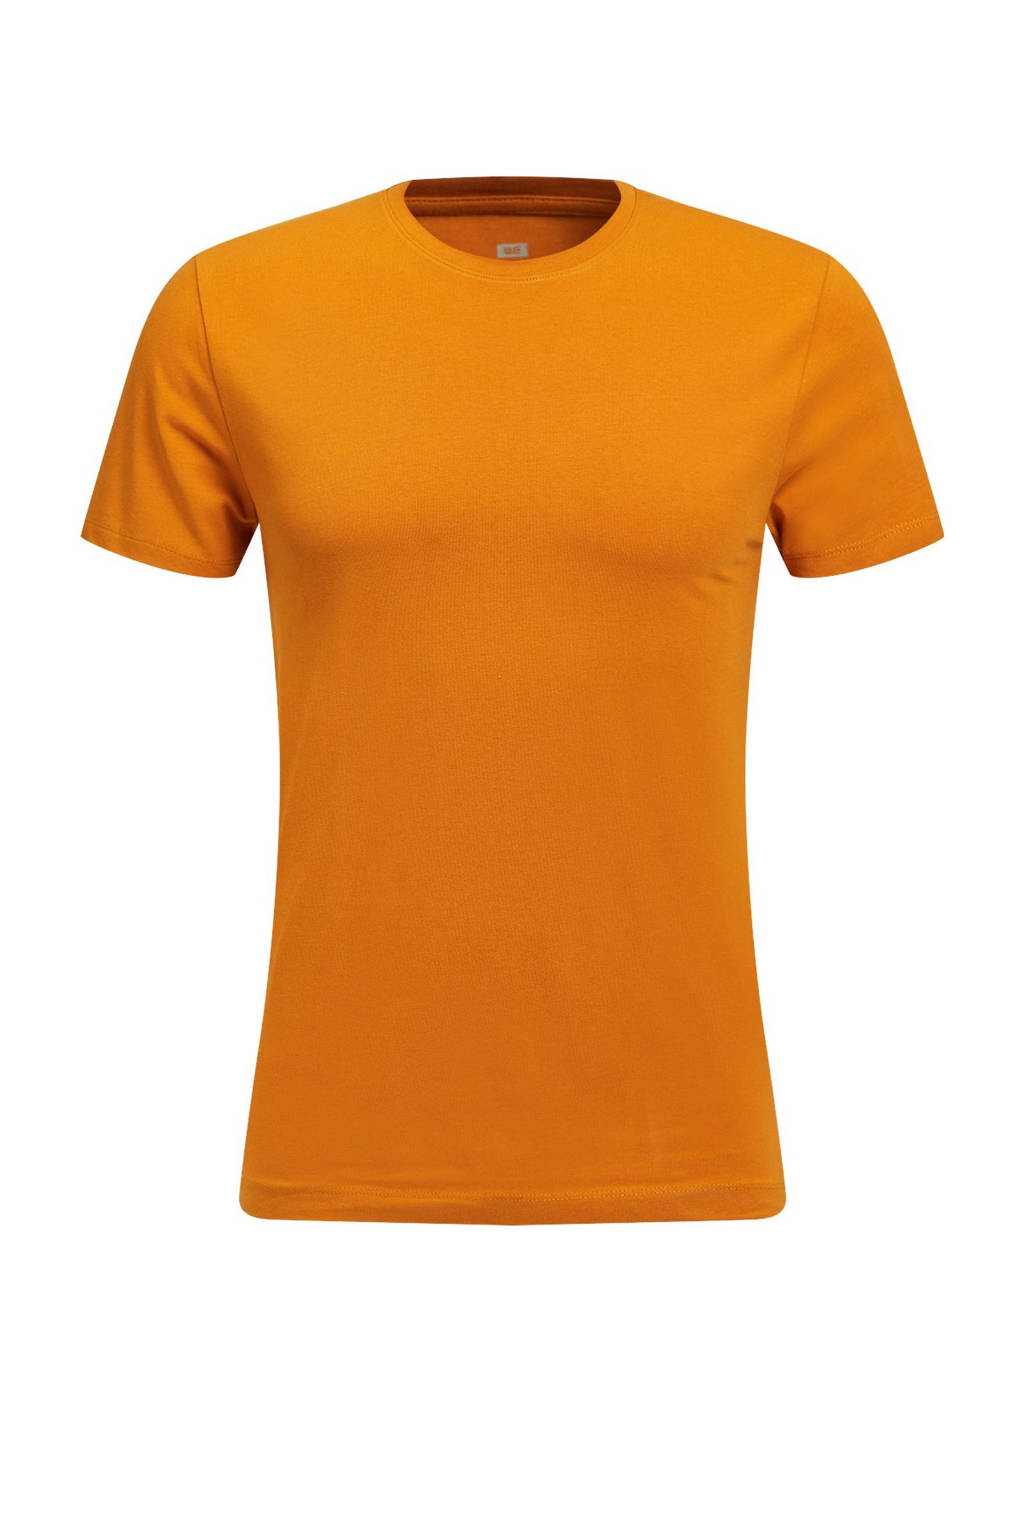 WE Fashion Fundamental T-shirt okergeel, Okergeel